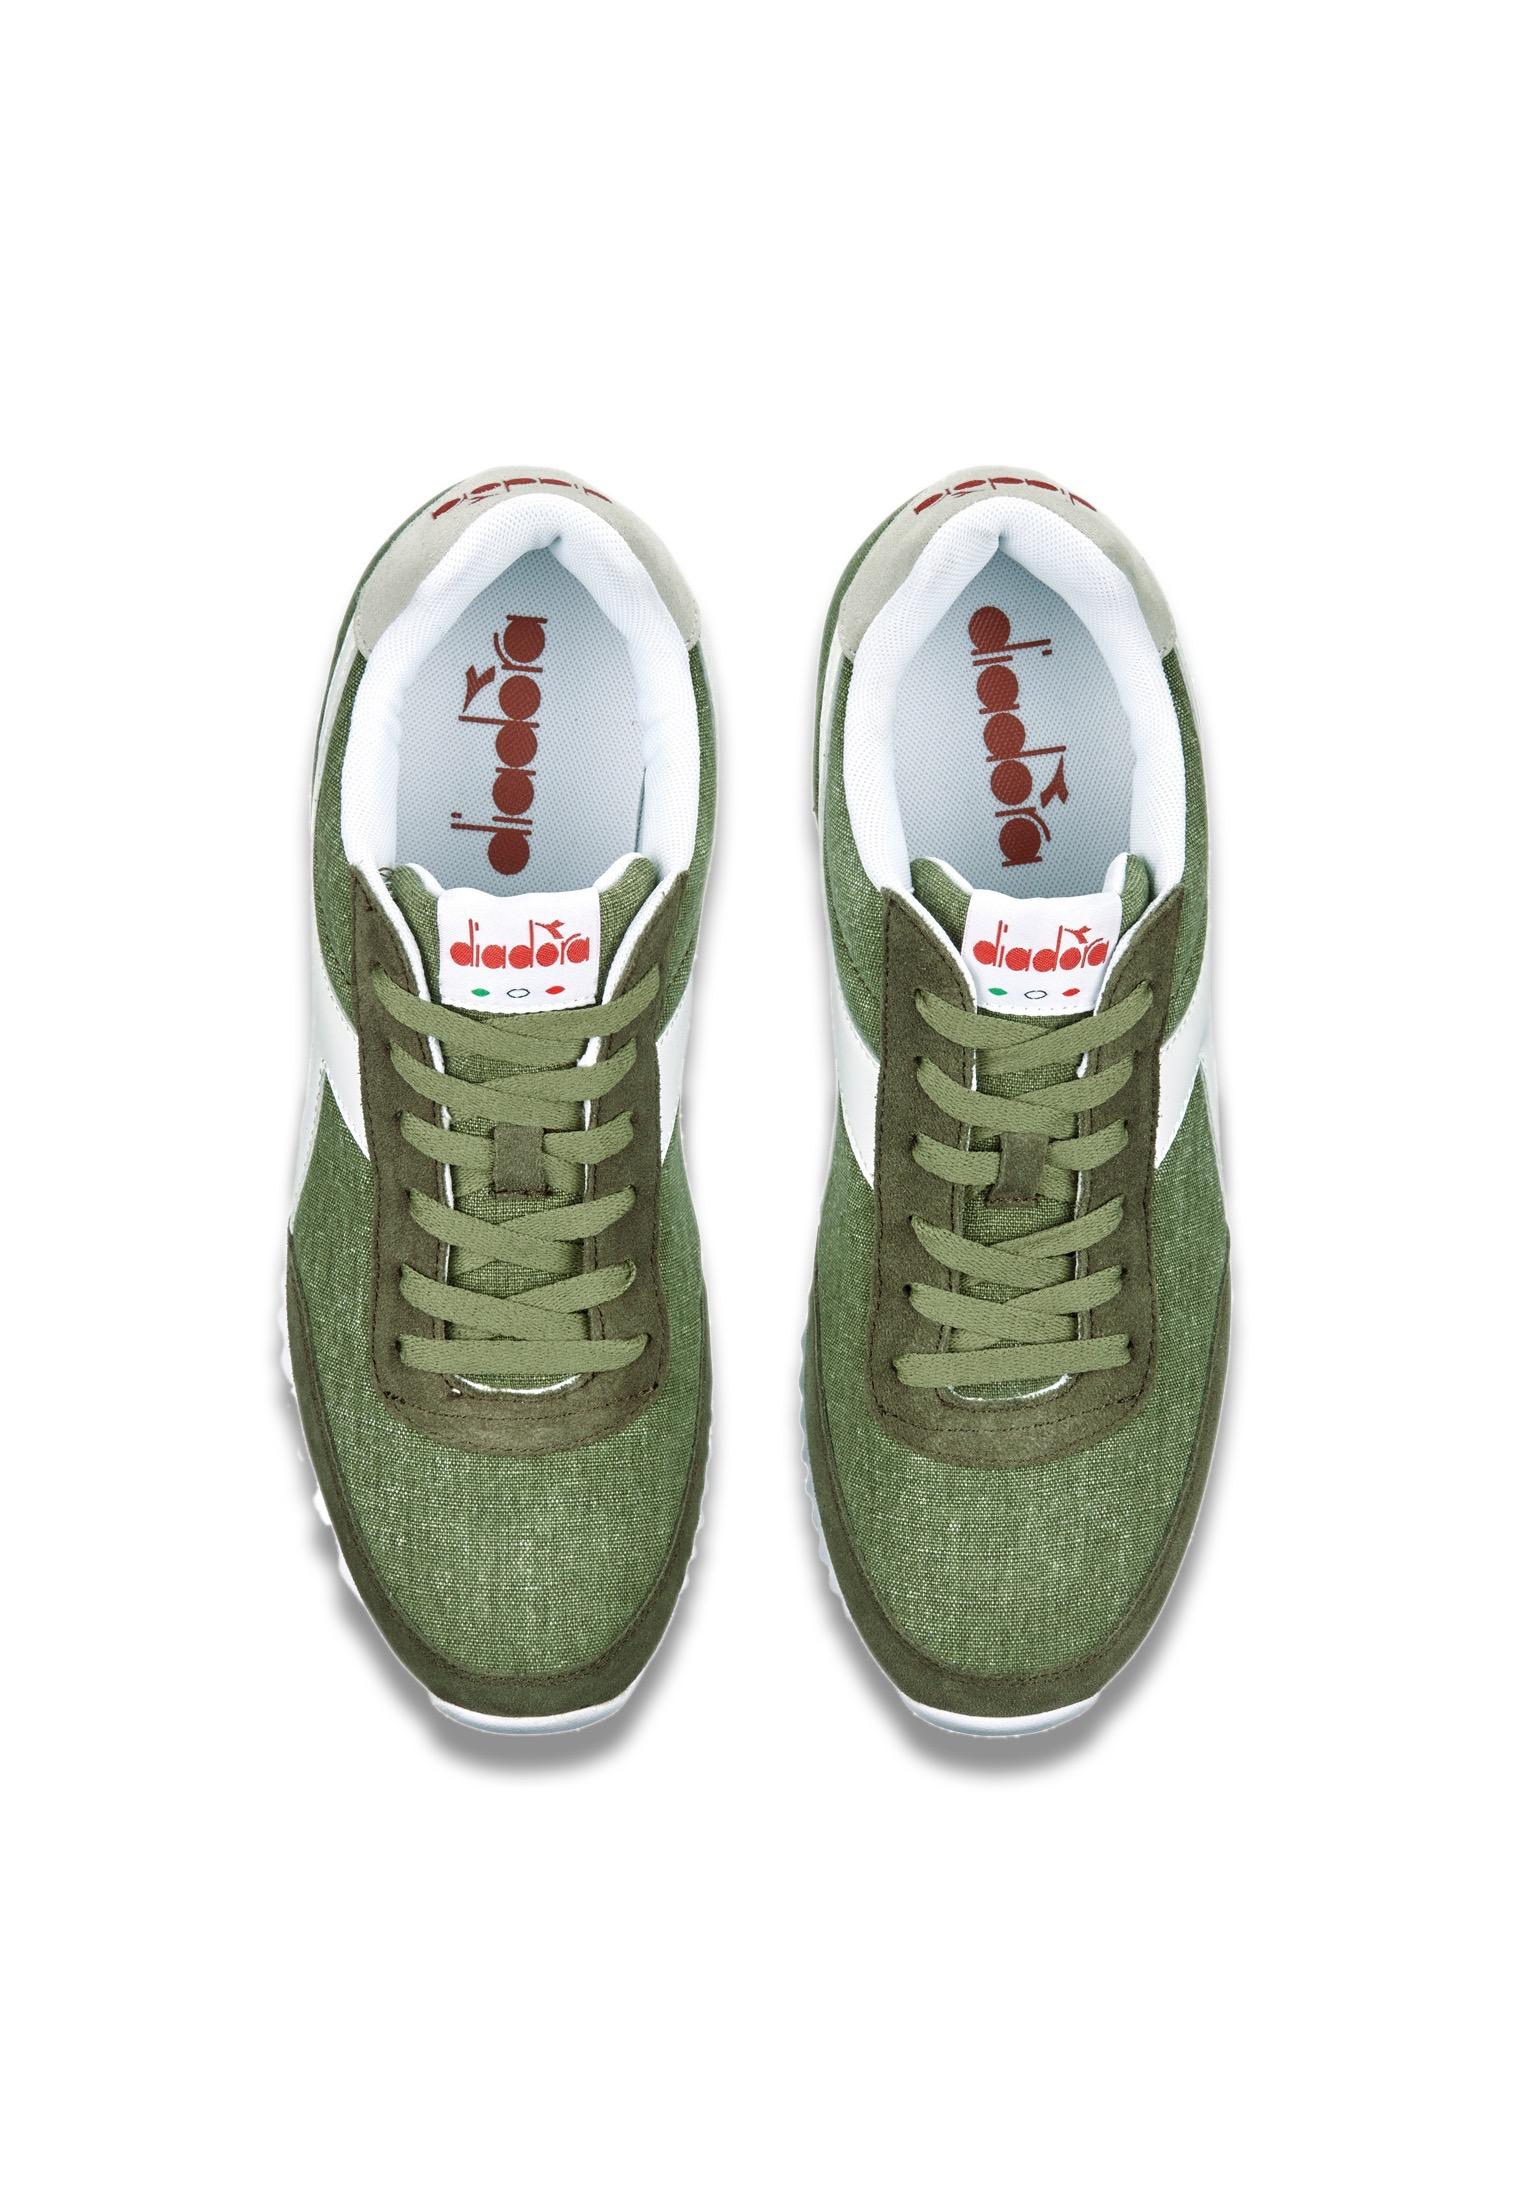 Scarpe-Diadora-Jog-Light-C-Sneakers-sportive-uomo-donna-vari-colori-e-taglie miniatura 46